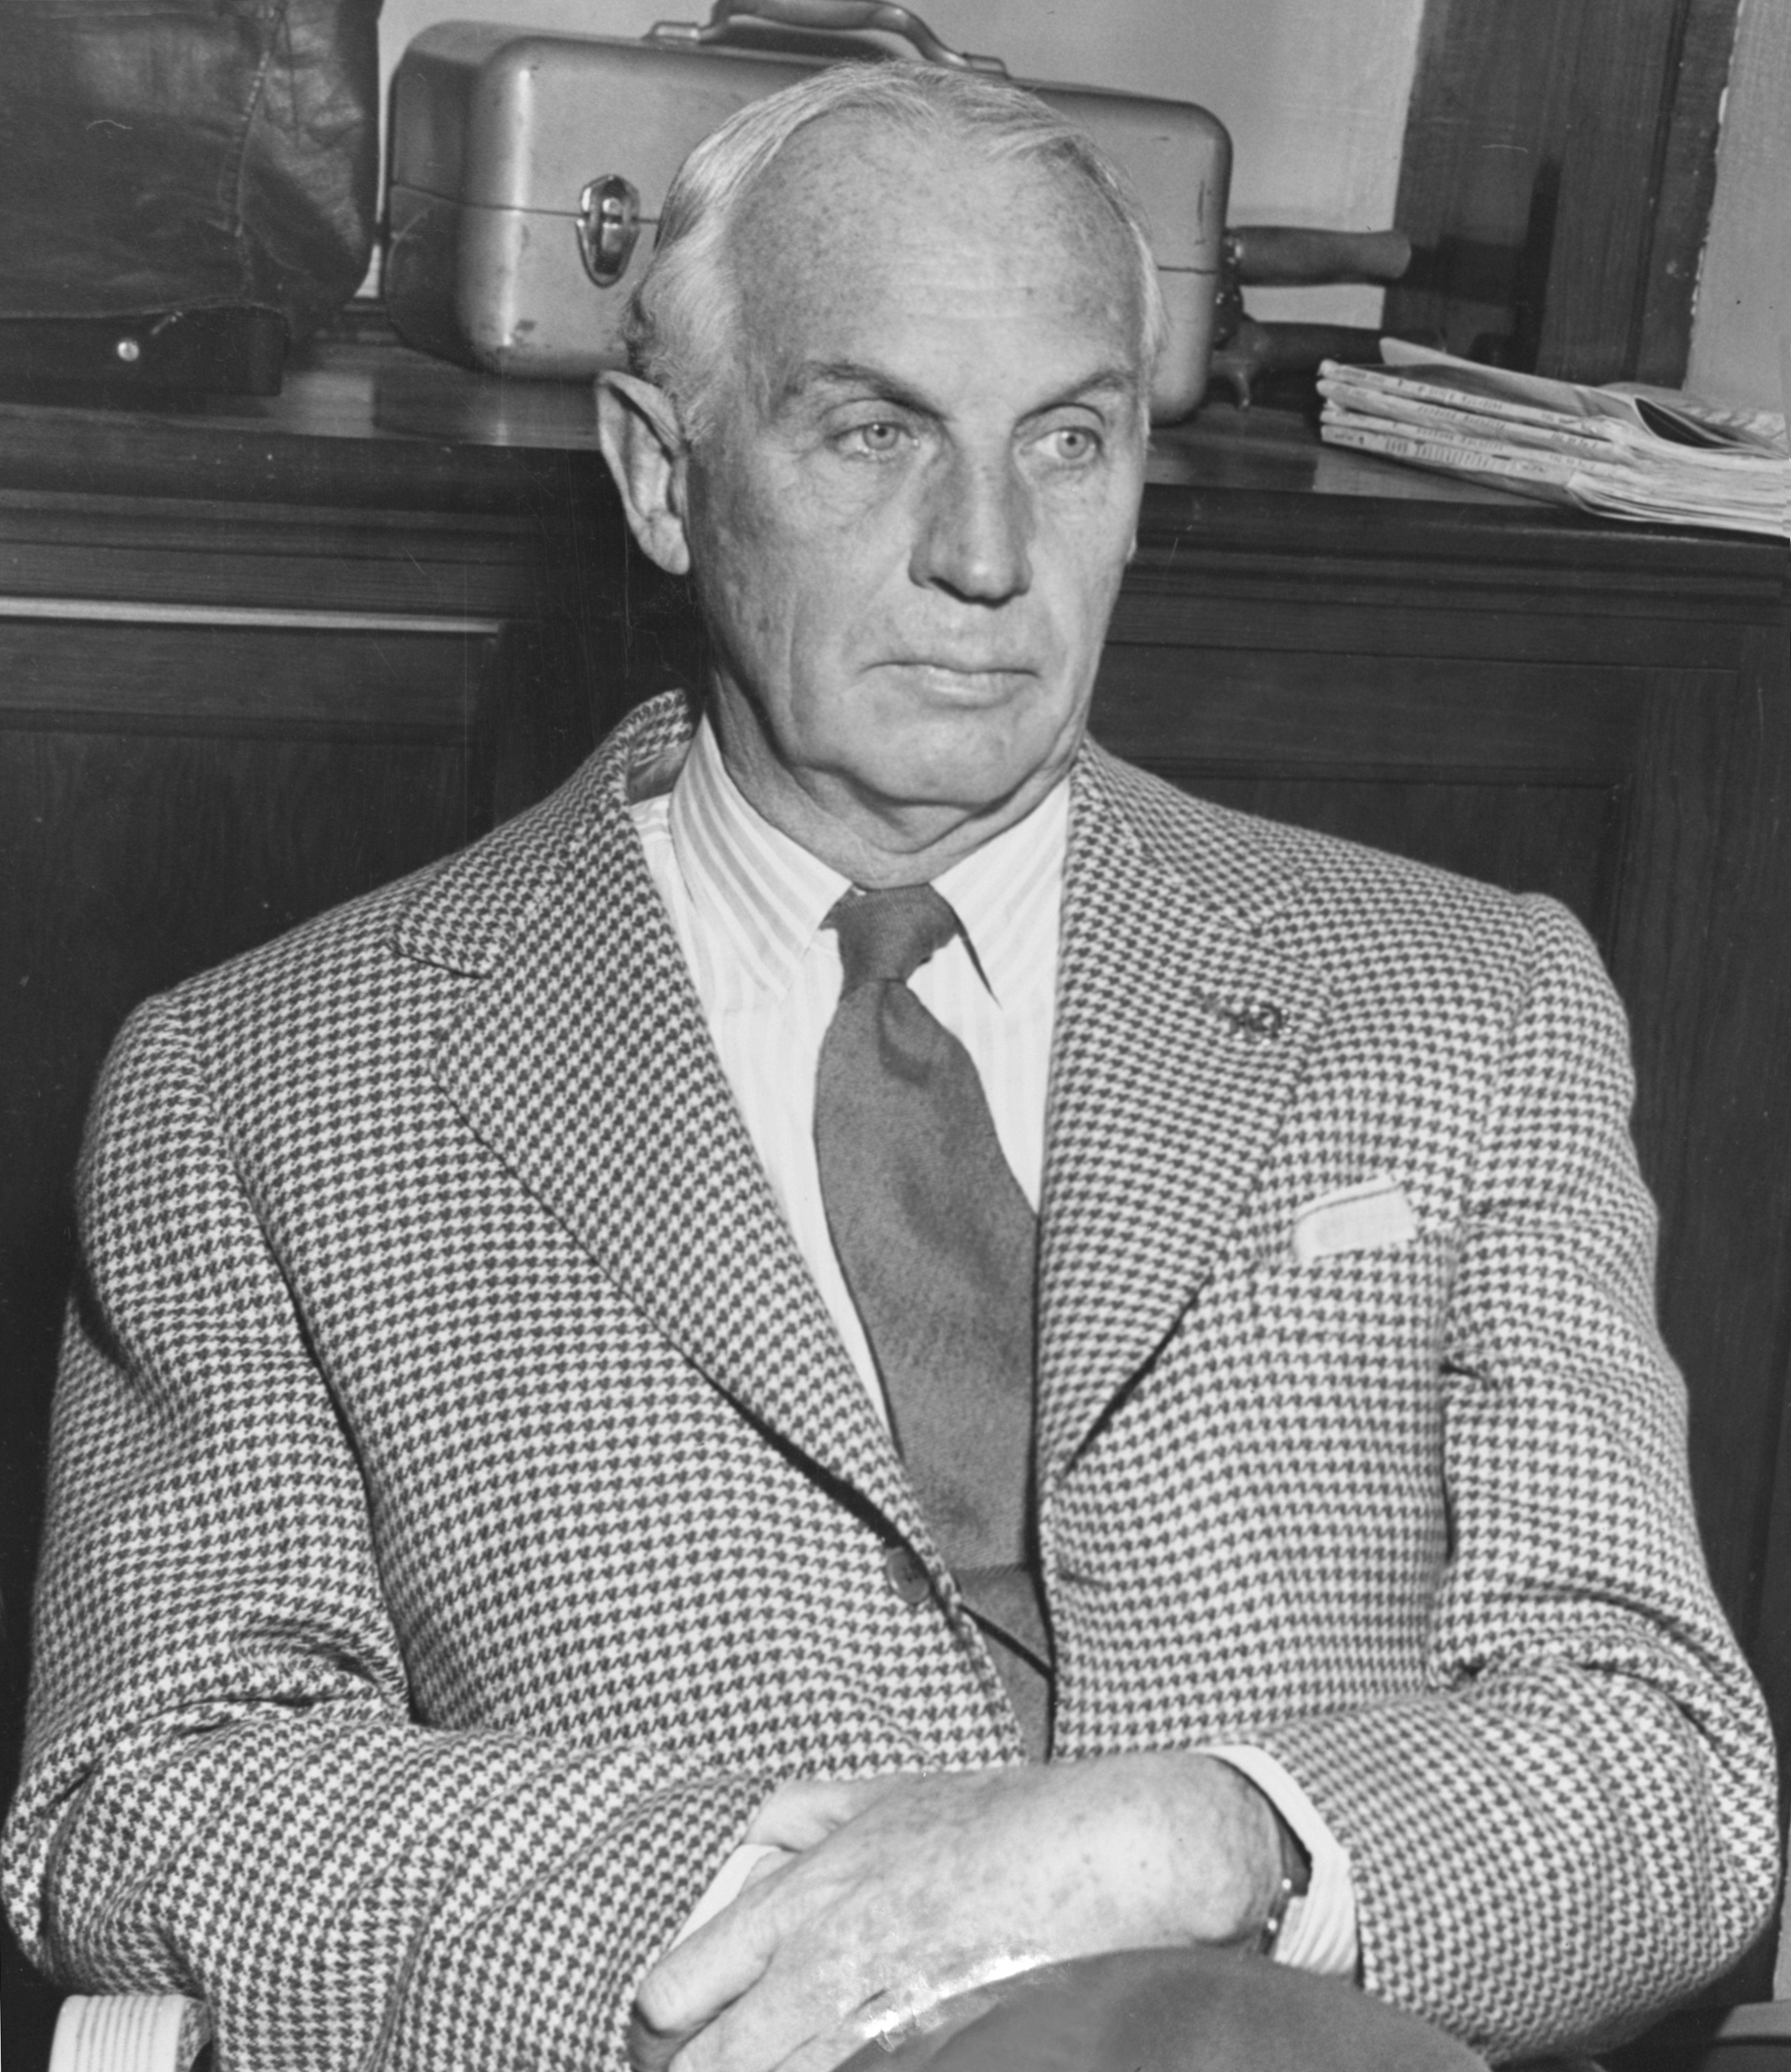 George D. Widener Jr. (E. Martin Jessee photo/Keeneland Library)